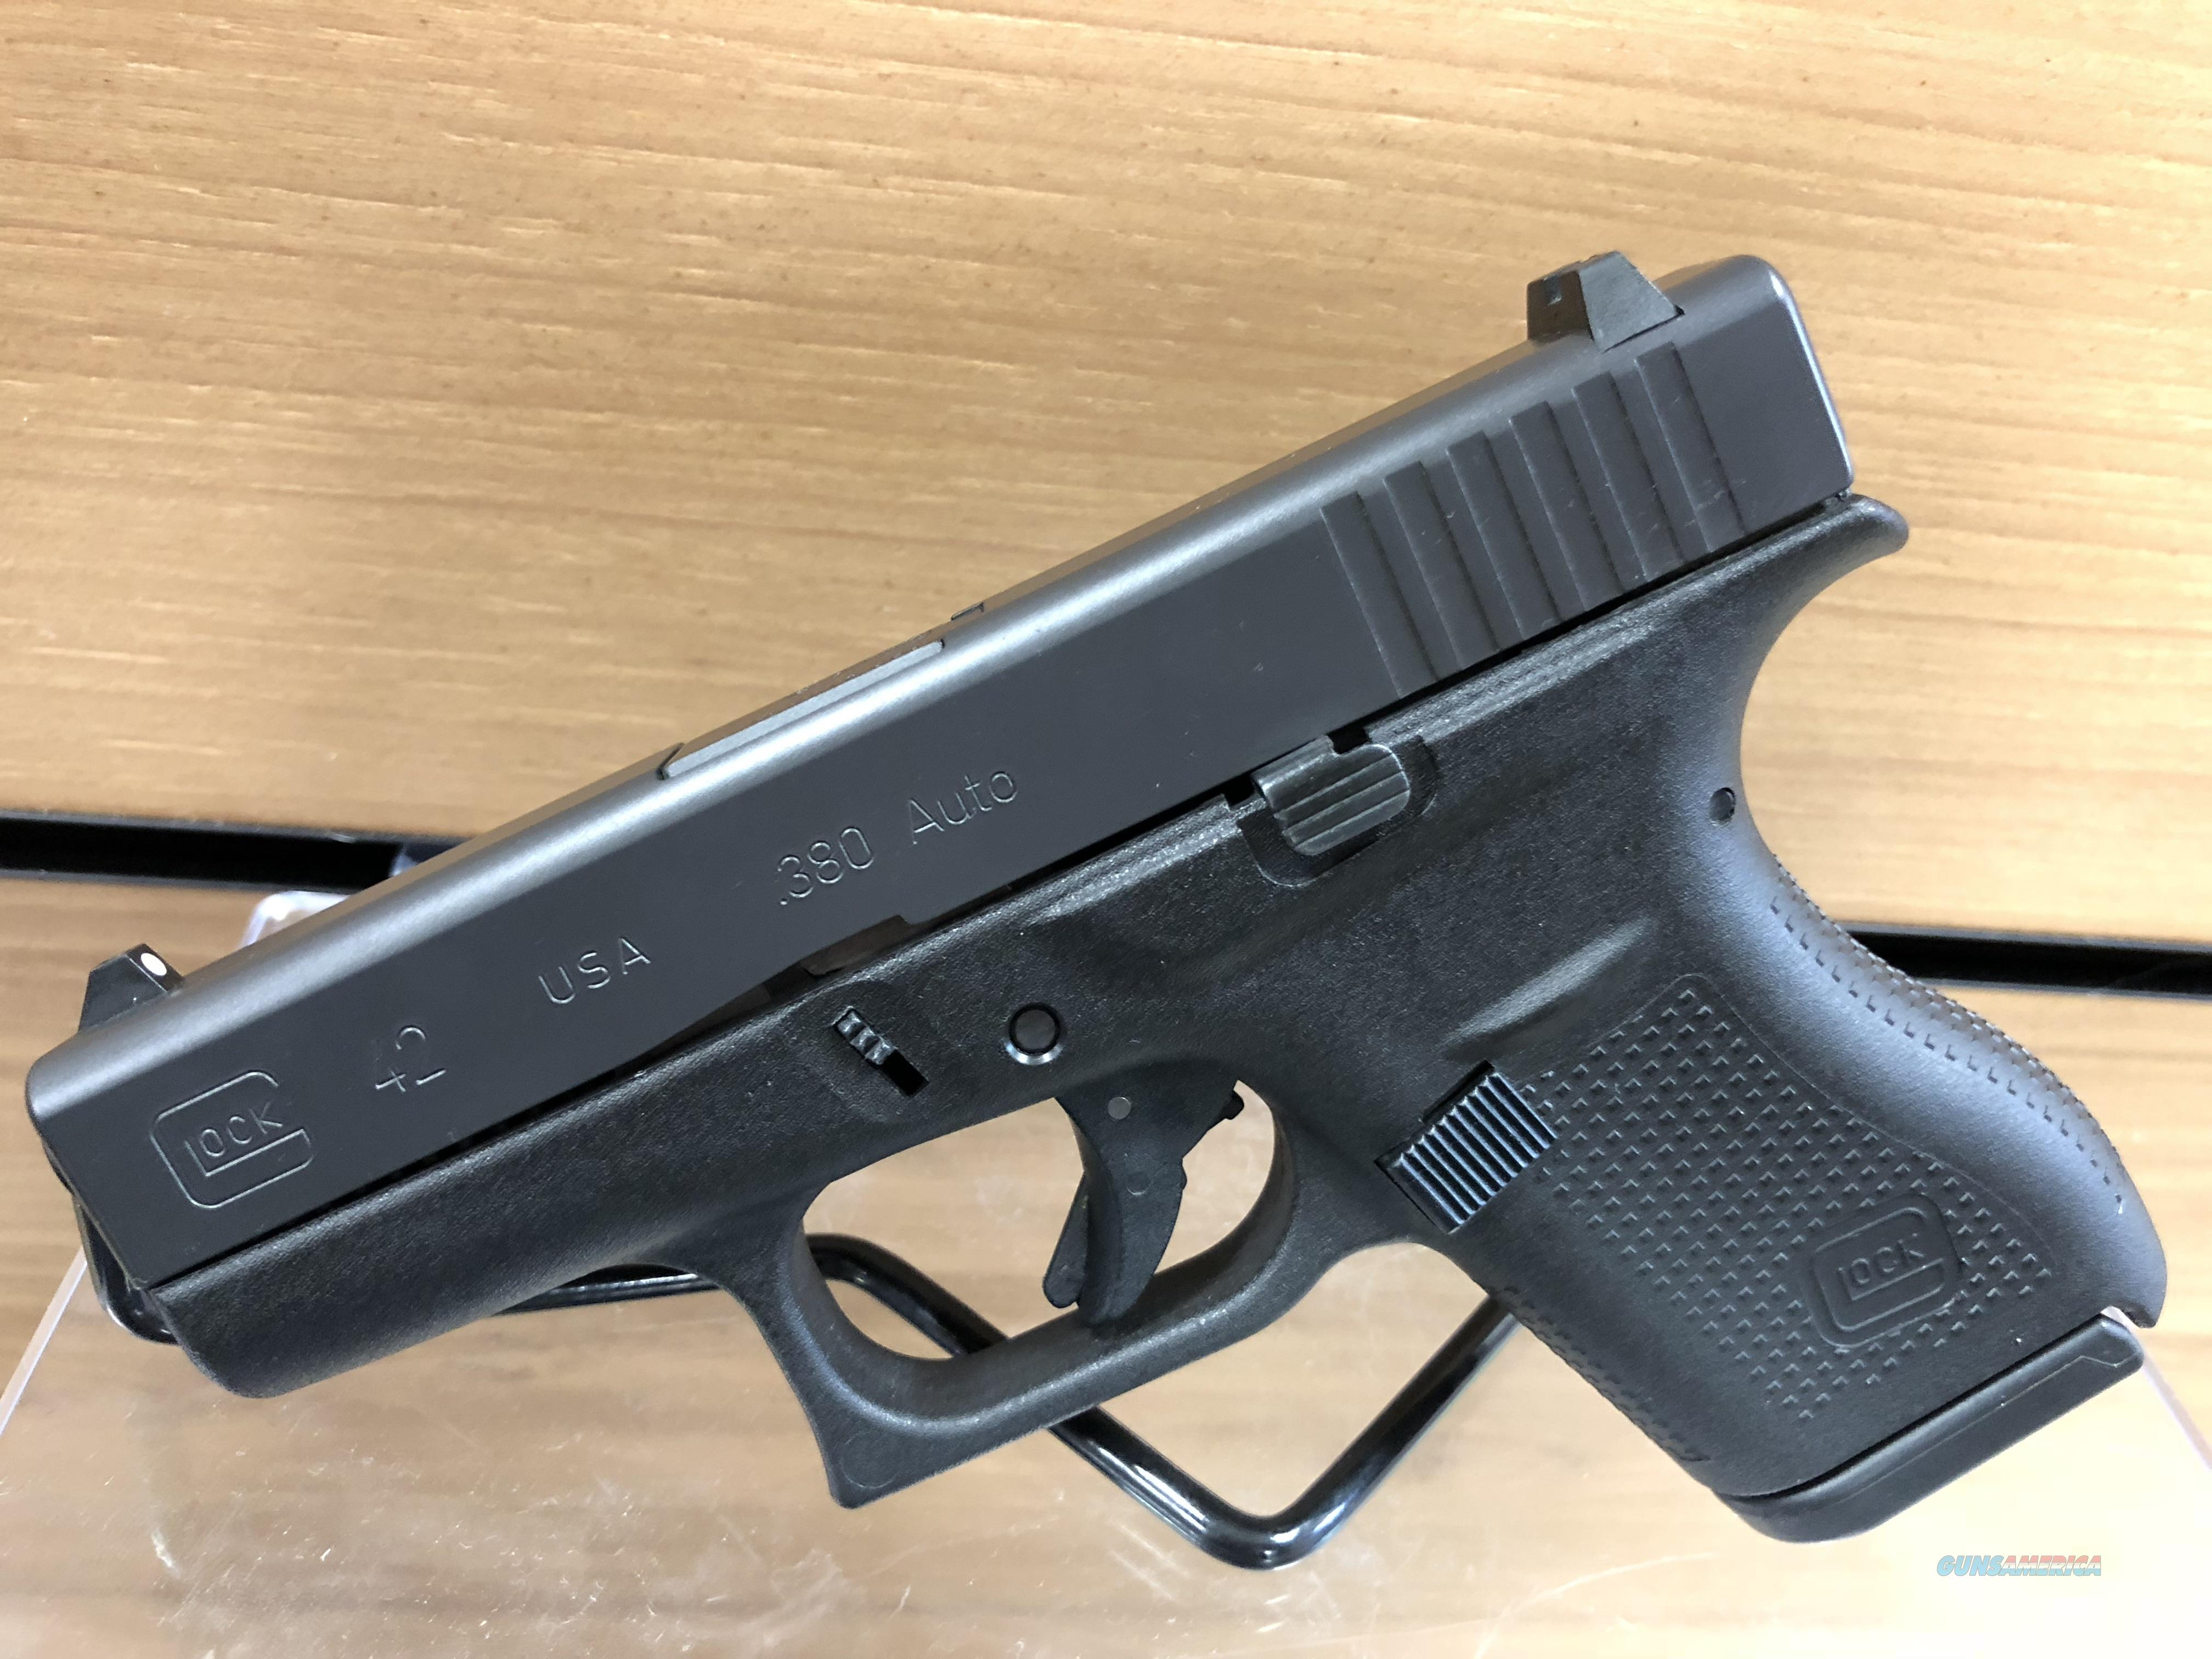 USED GLOCK 42, .380ACP  Guns > Pistols > Glock Pistols > 42